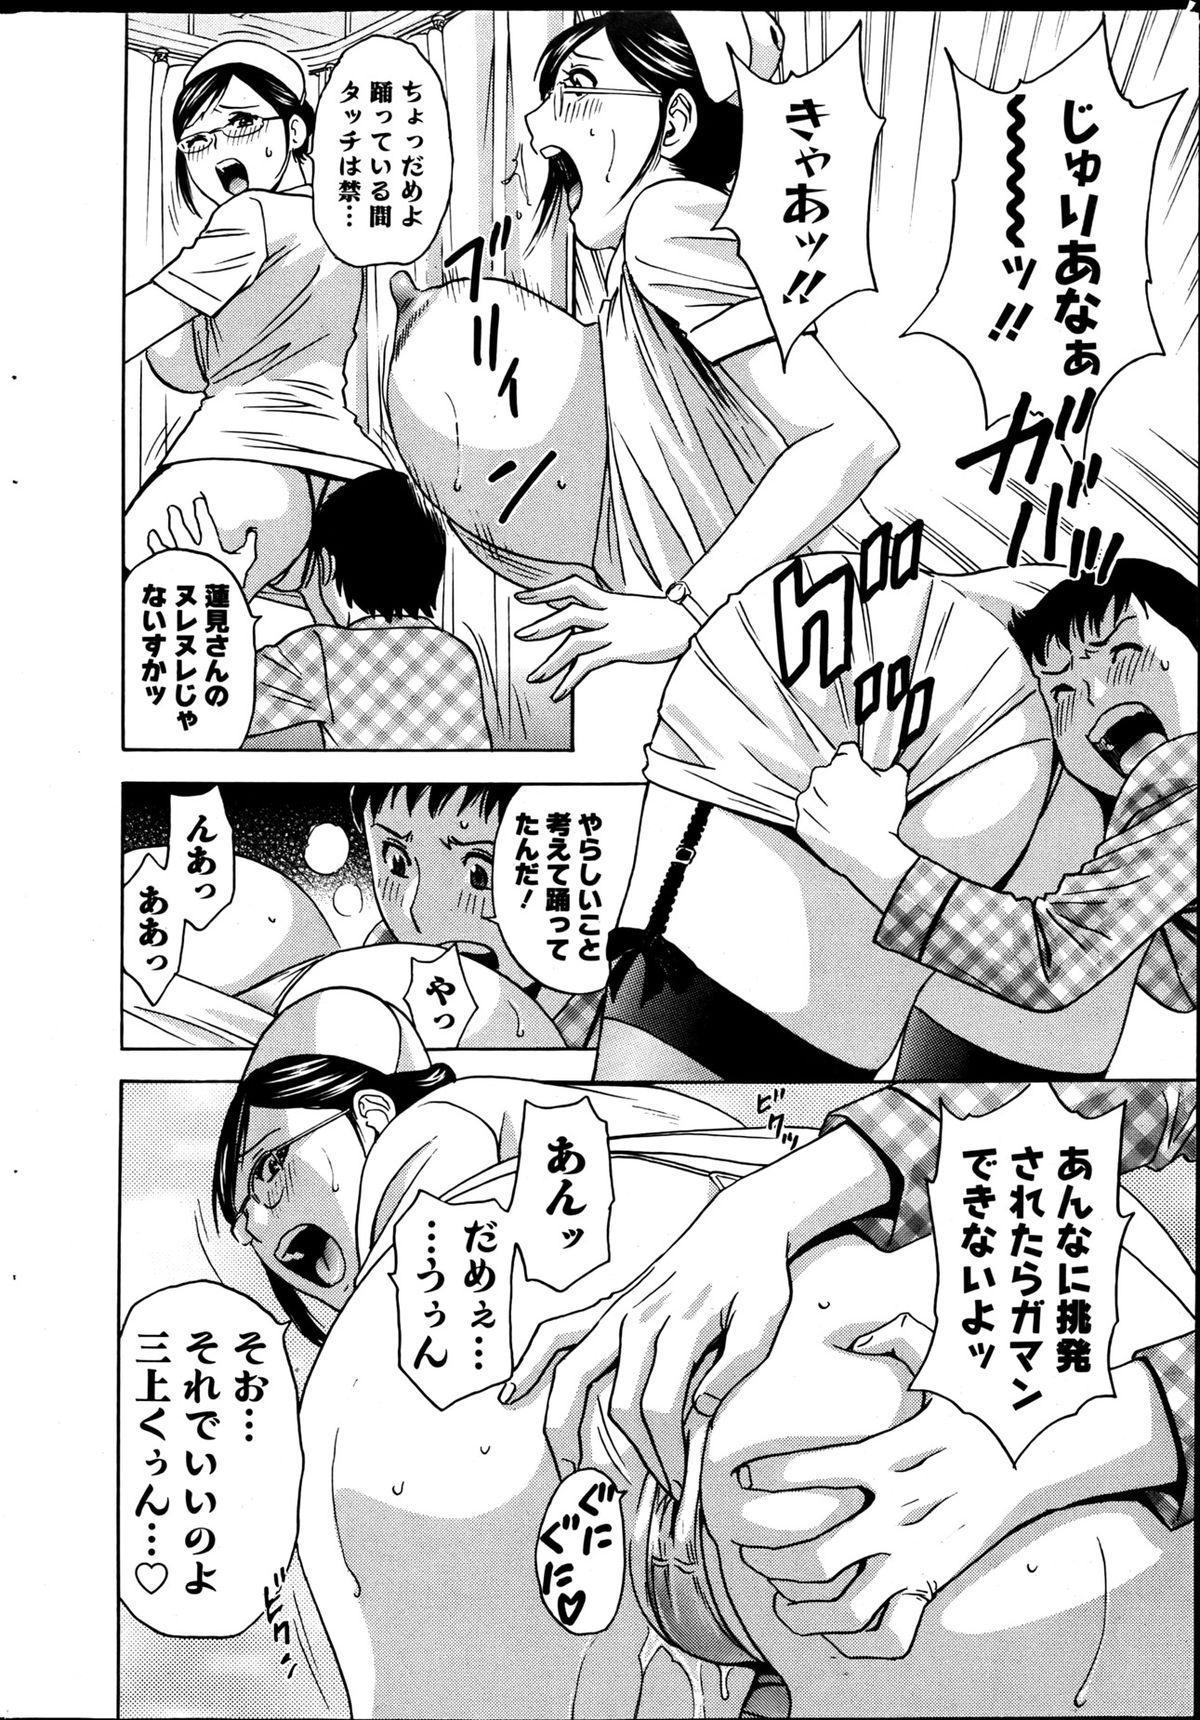 Hidemaru Nyuukan Madam Special 48